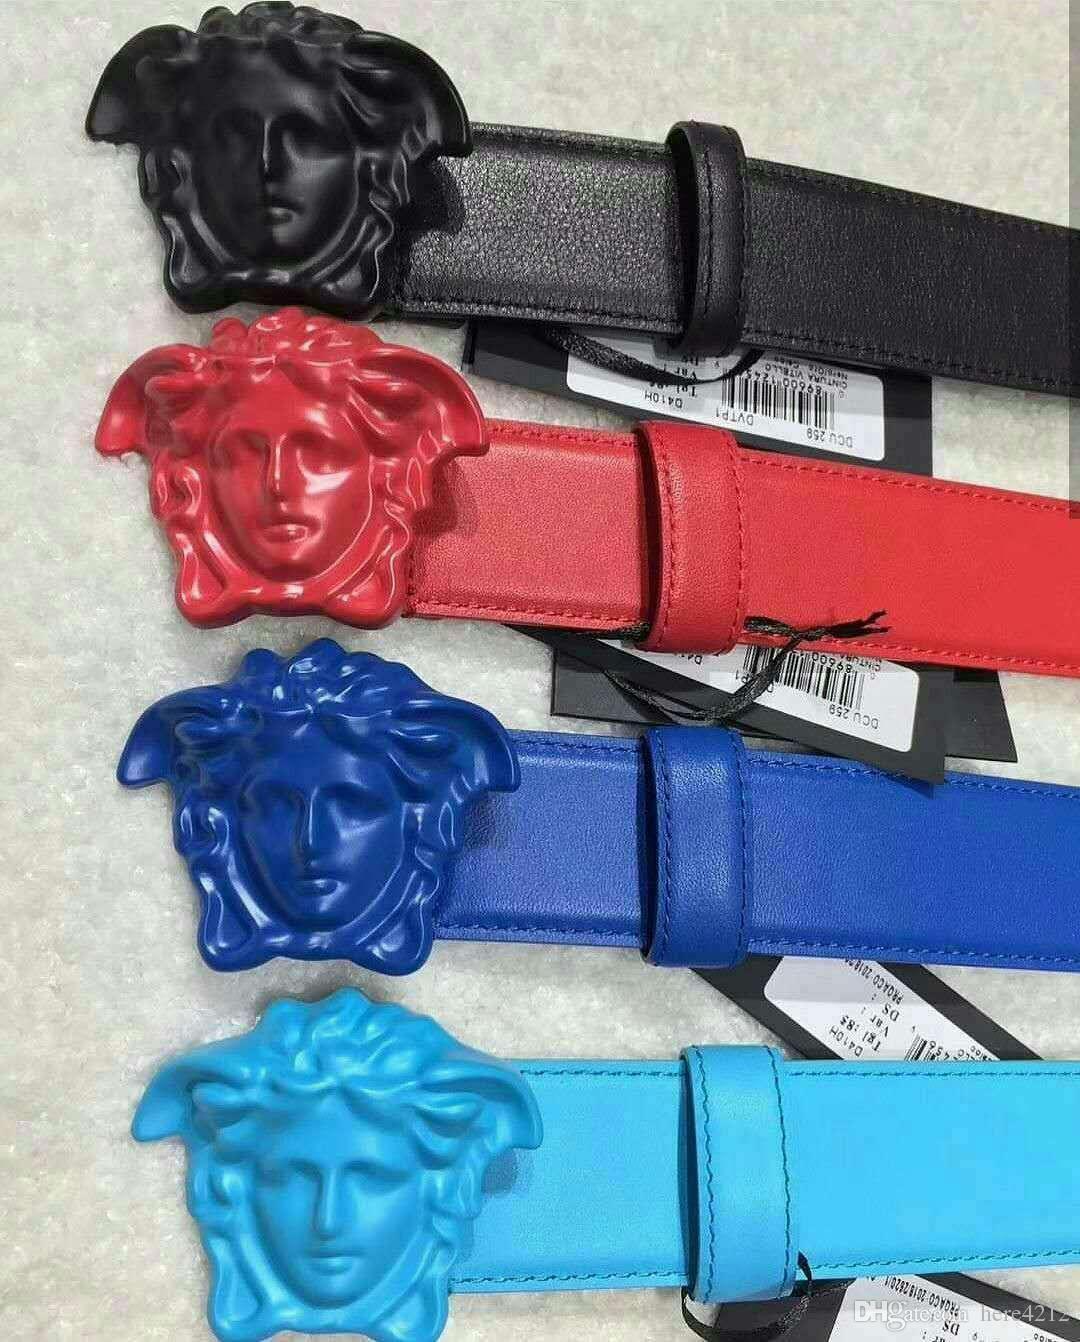 2018 New designer belts luxury belts for men big buckle belt top fashion mens leather belts wholesale free shipping